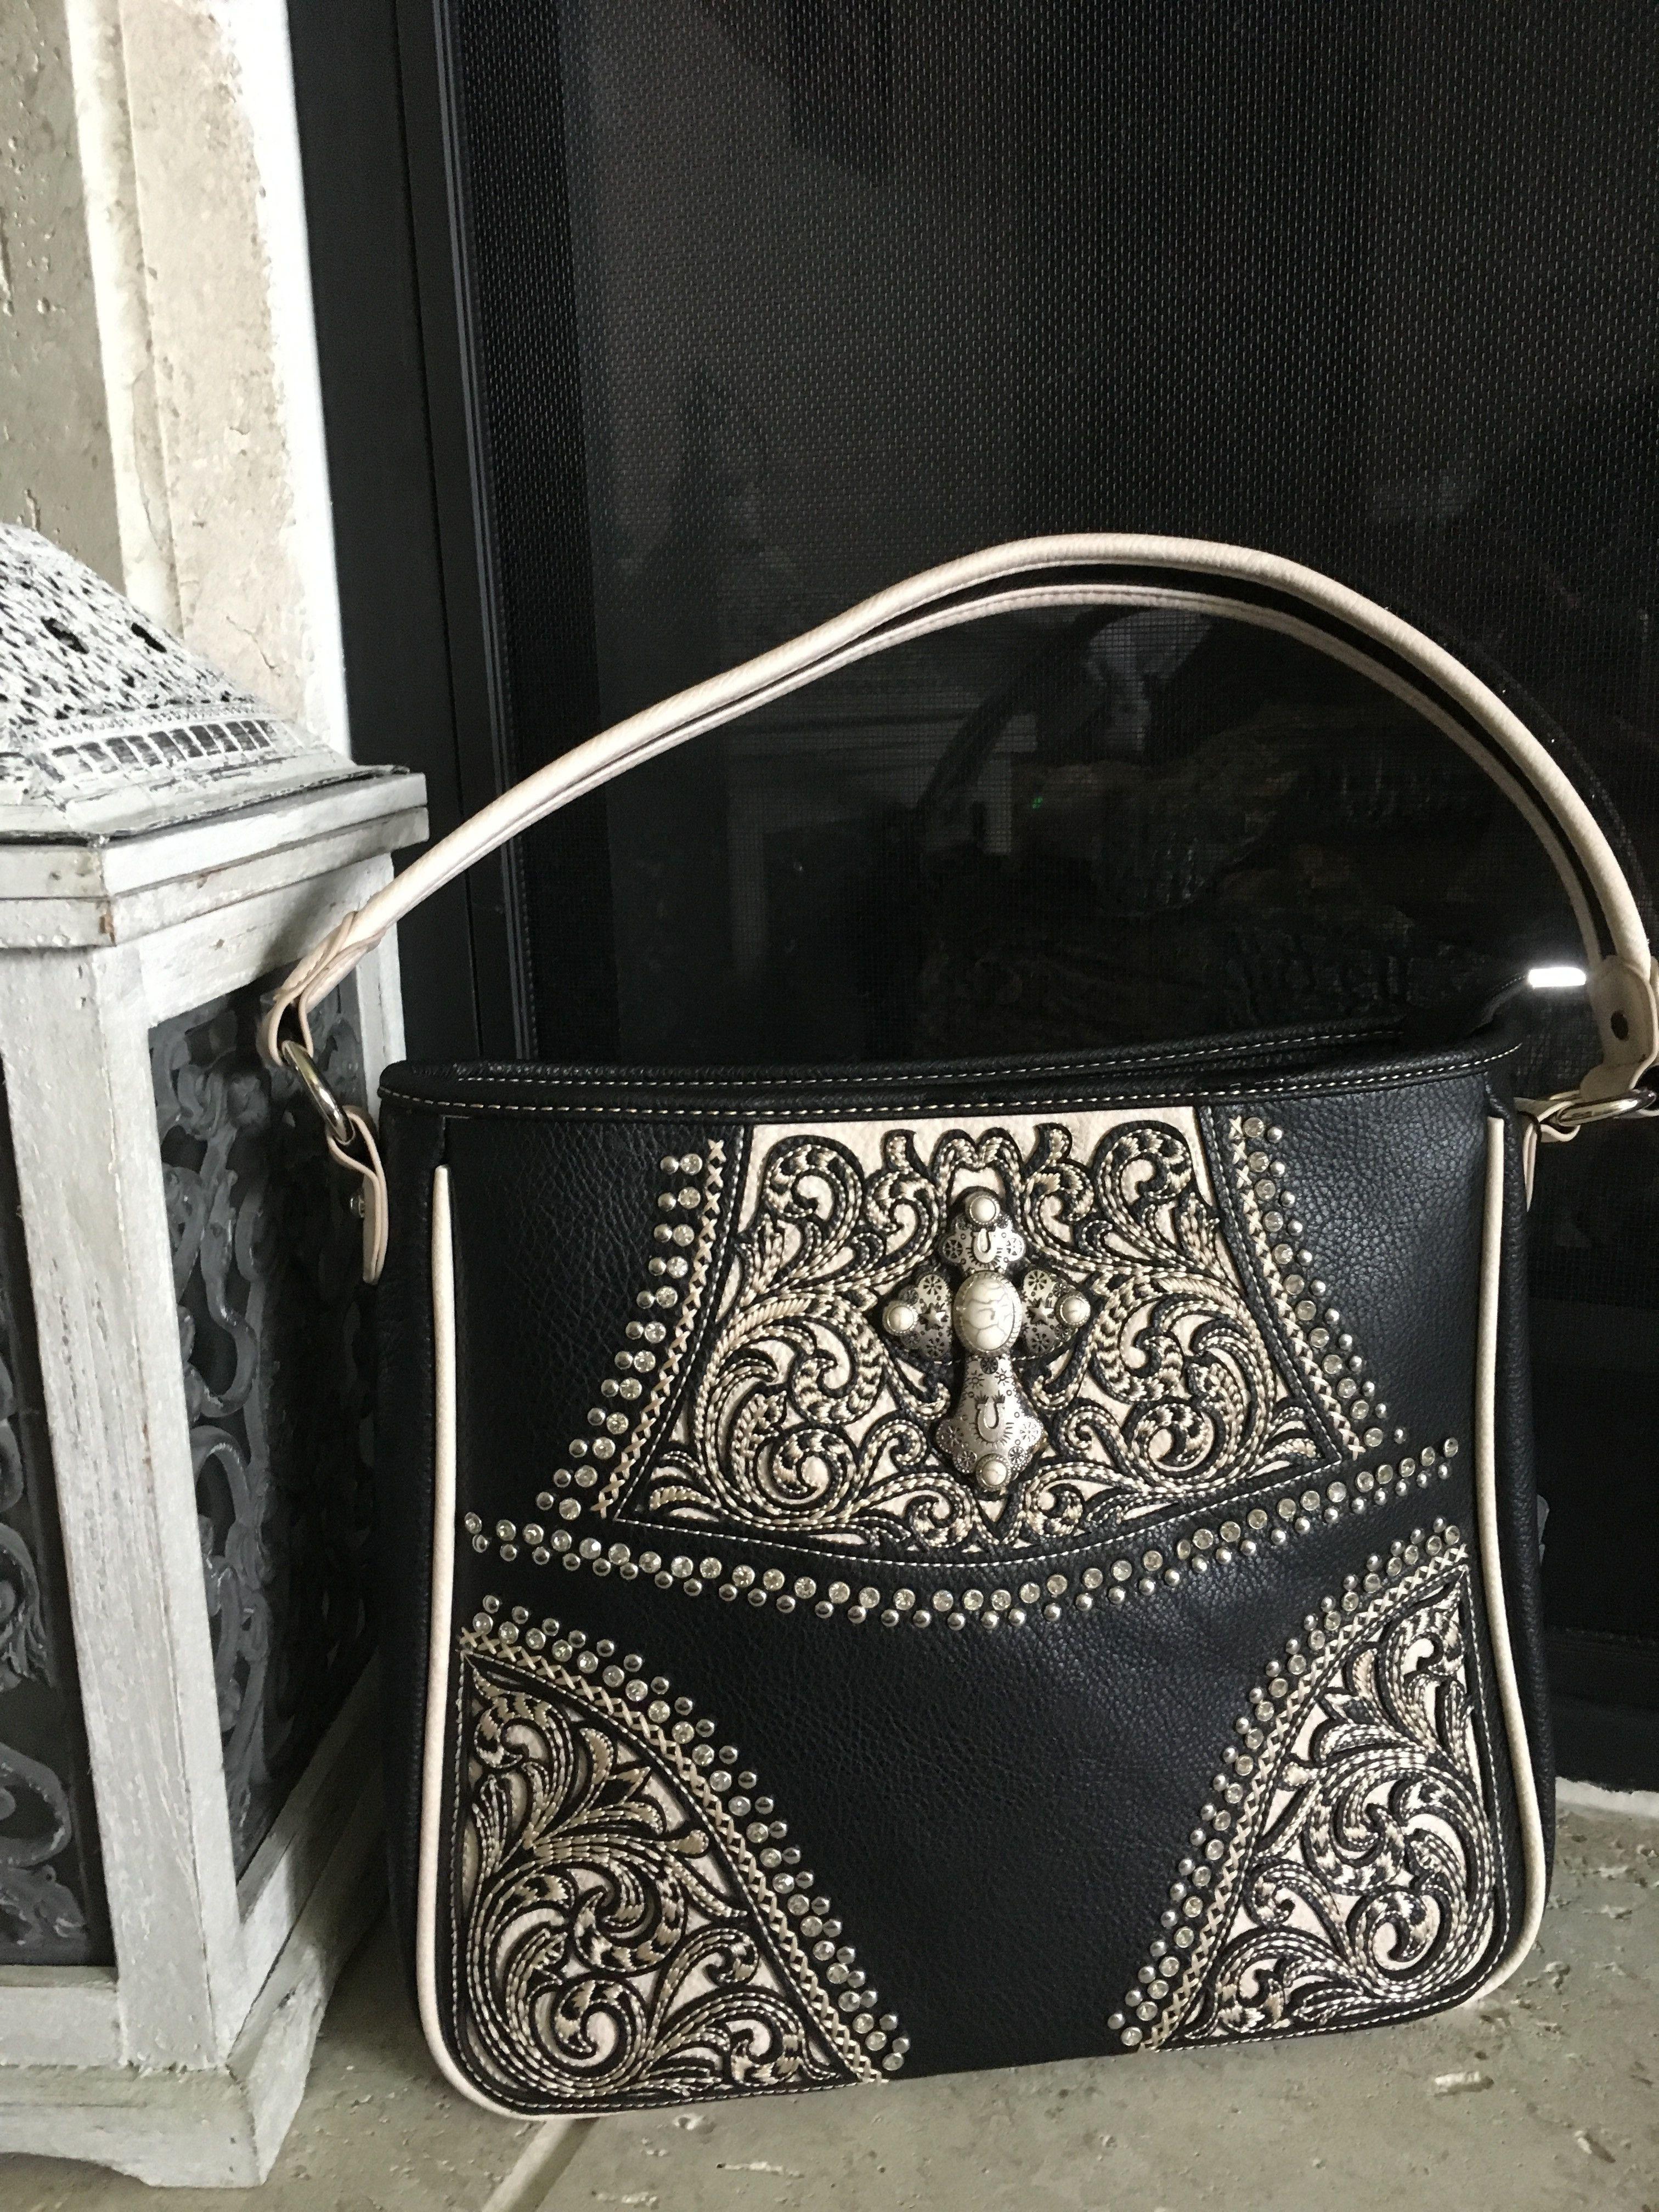 Stunning Embelished women's purse